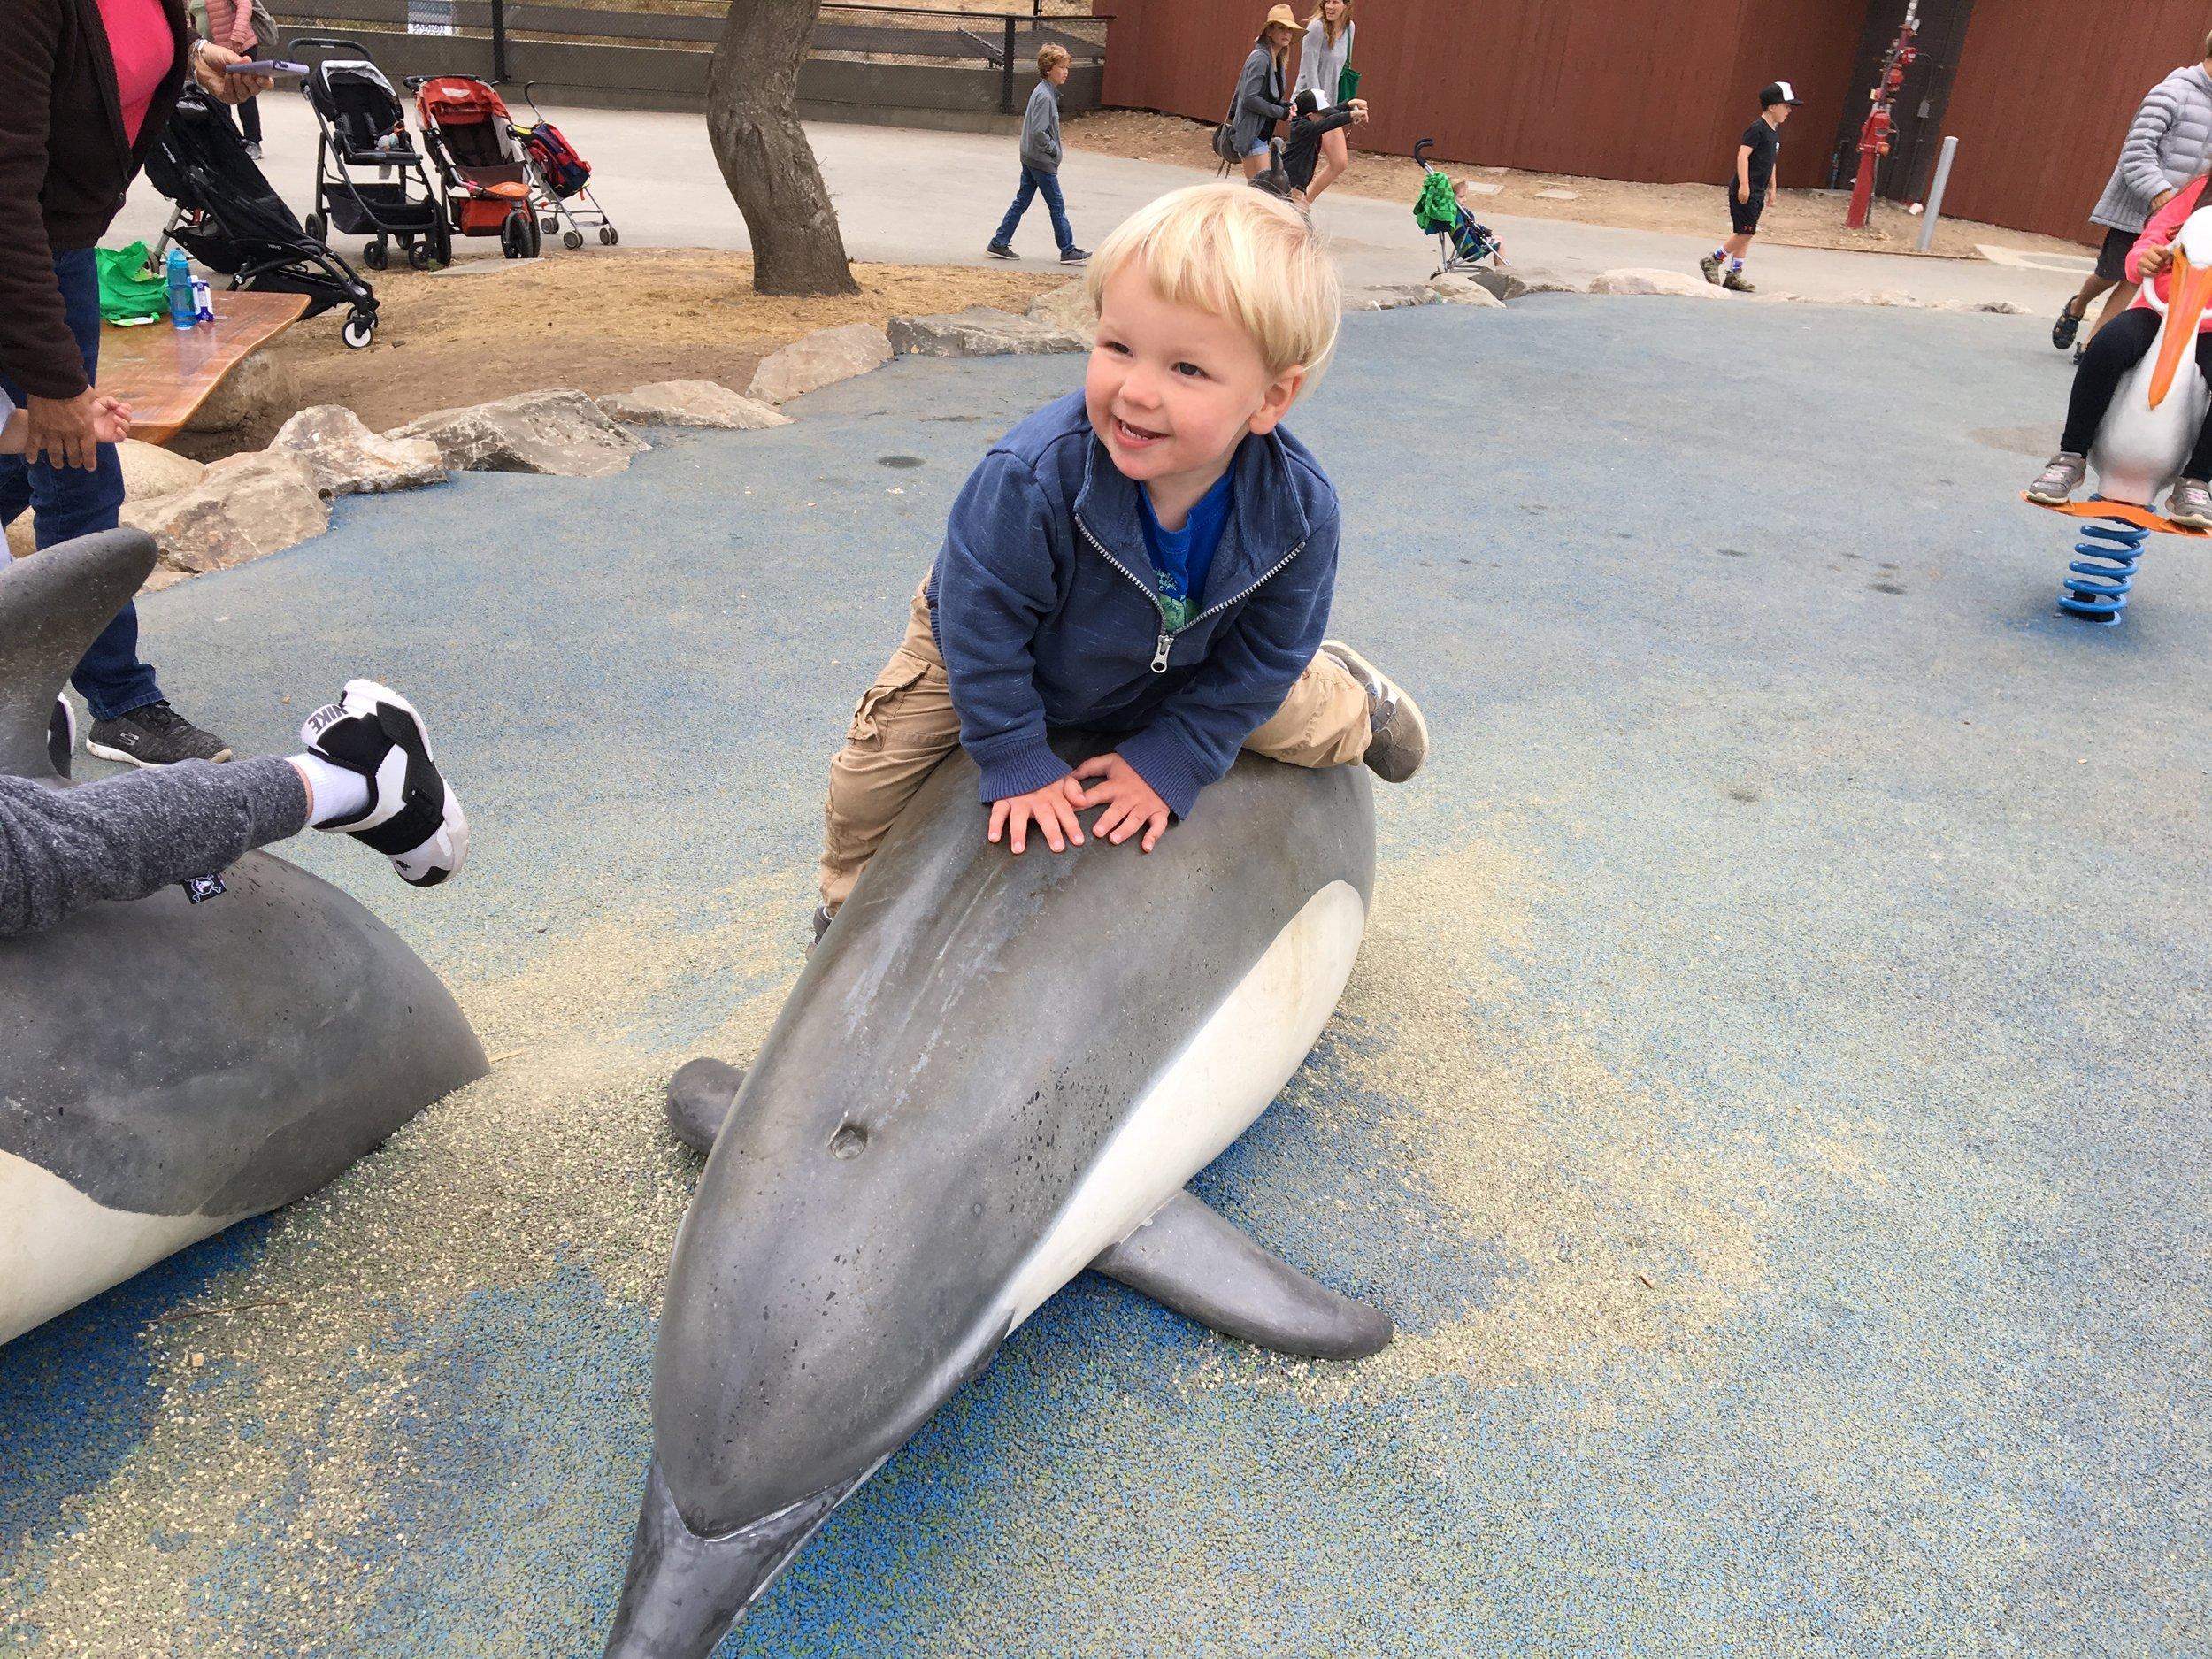 New Oakland Zoo playground